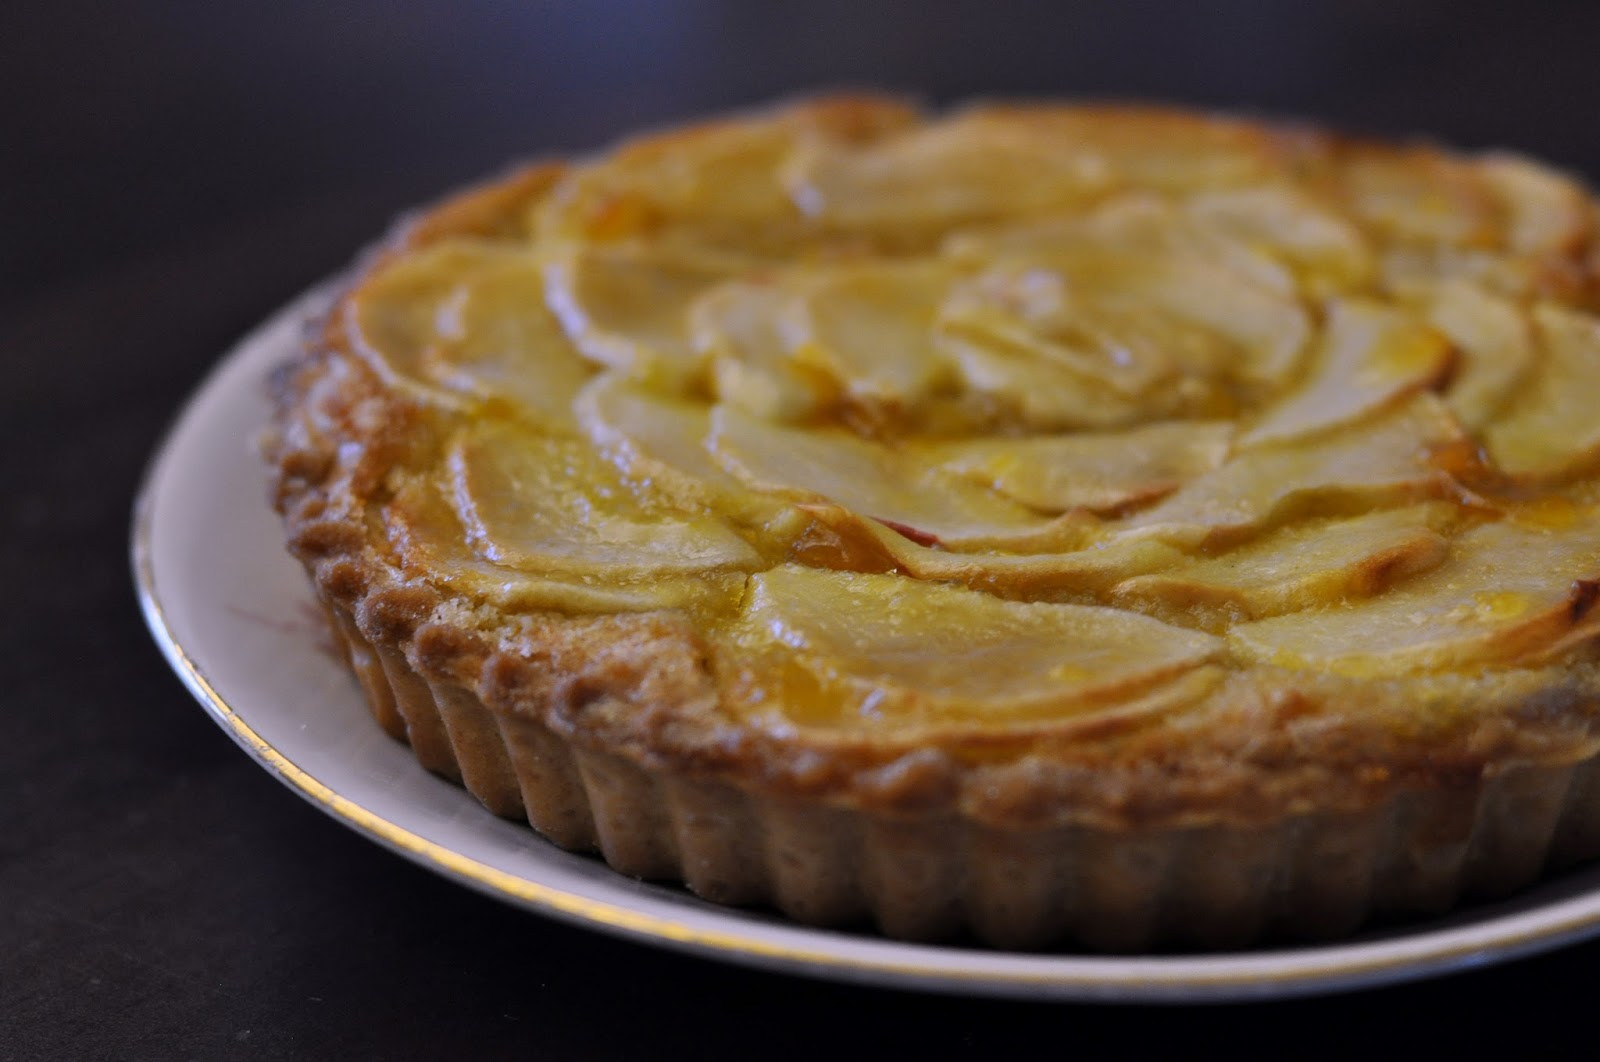 Bake Off Bake Along: Week 6 - Apple Frangipane | Sophie ...